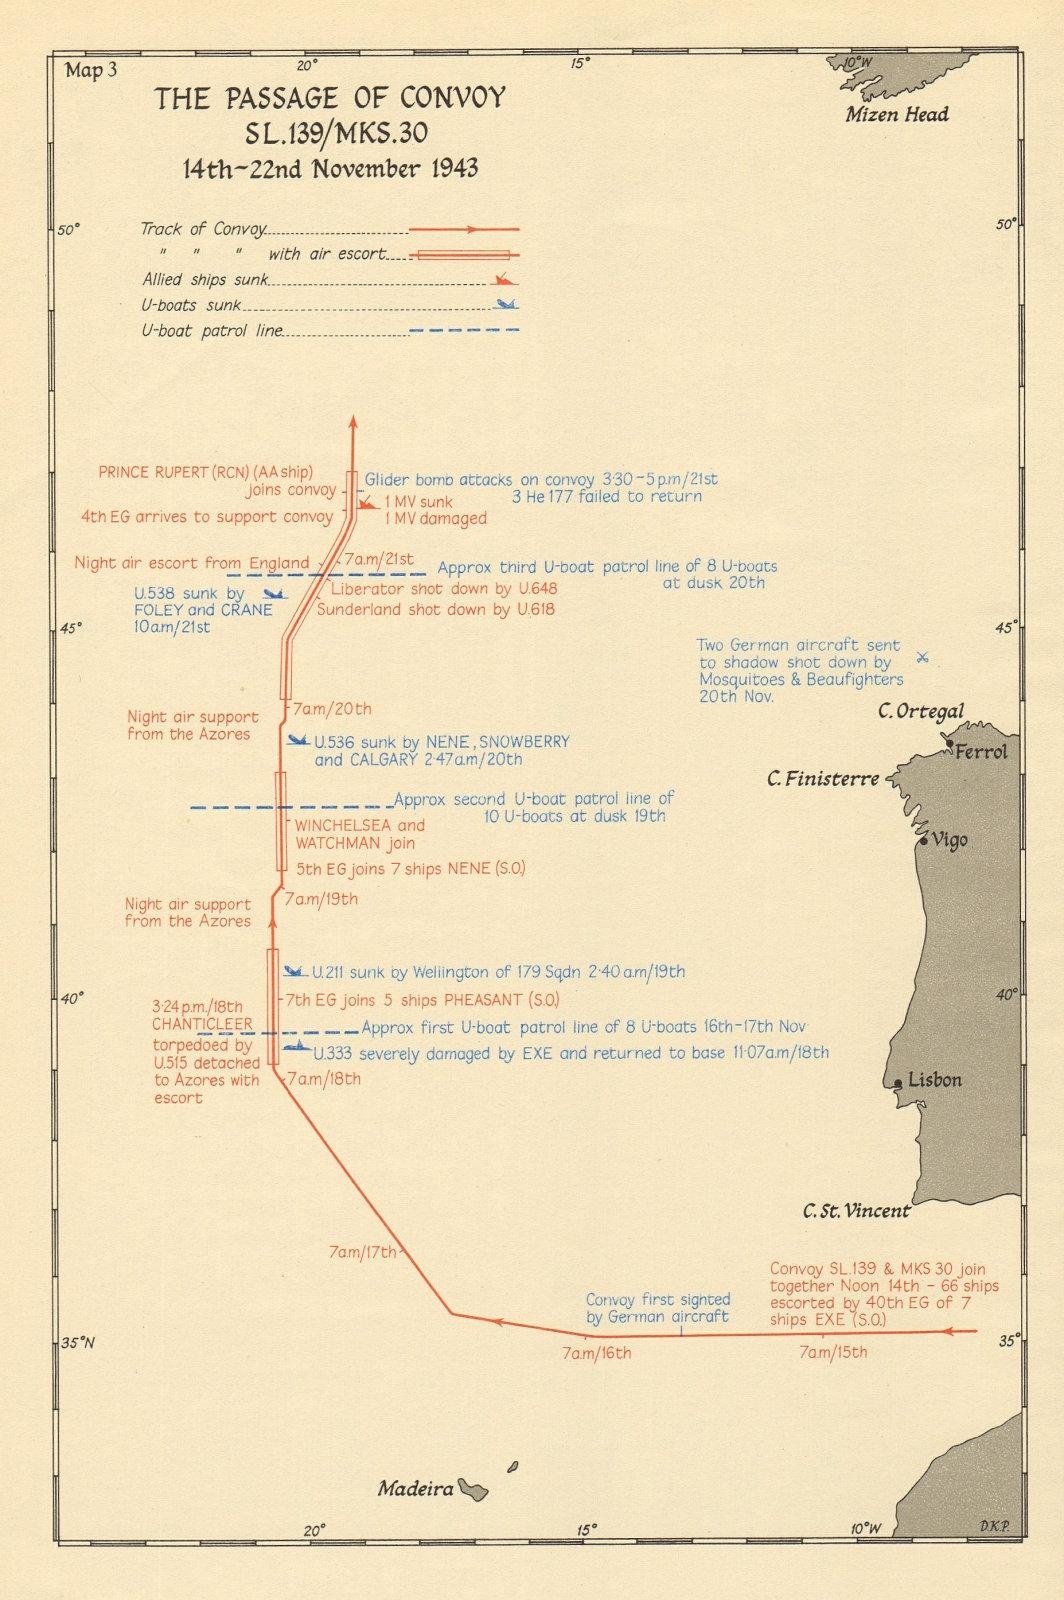 Battle of the Atlantic. Convoy SL 139/MKS 30, 14-22 November 1943 1954 old map